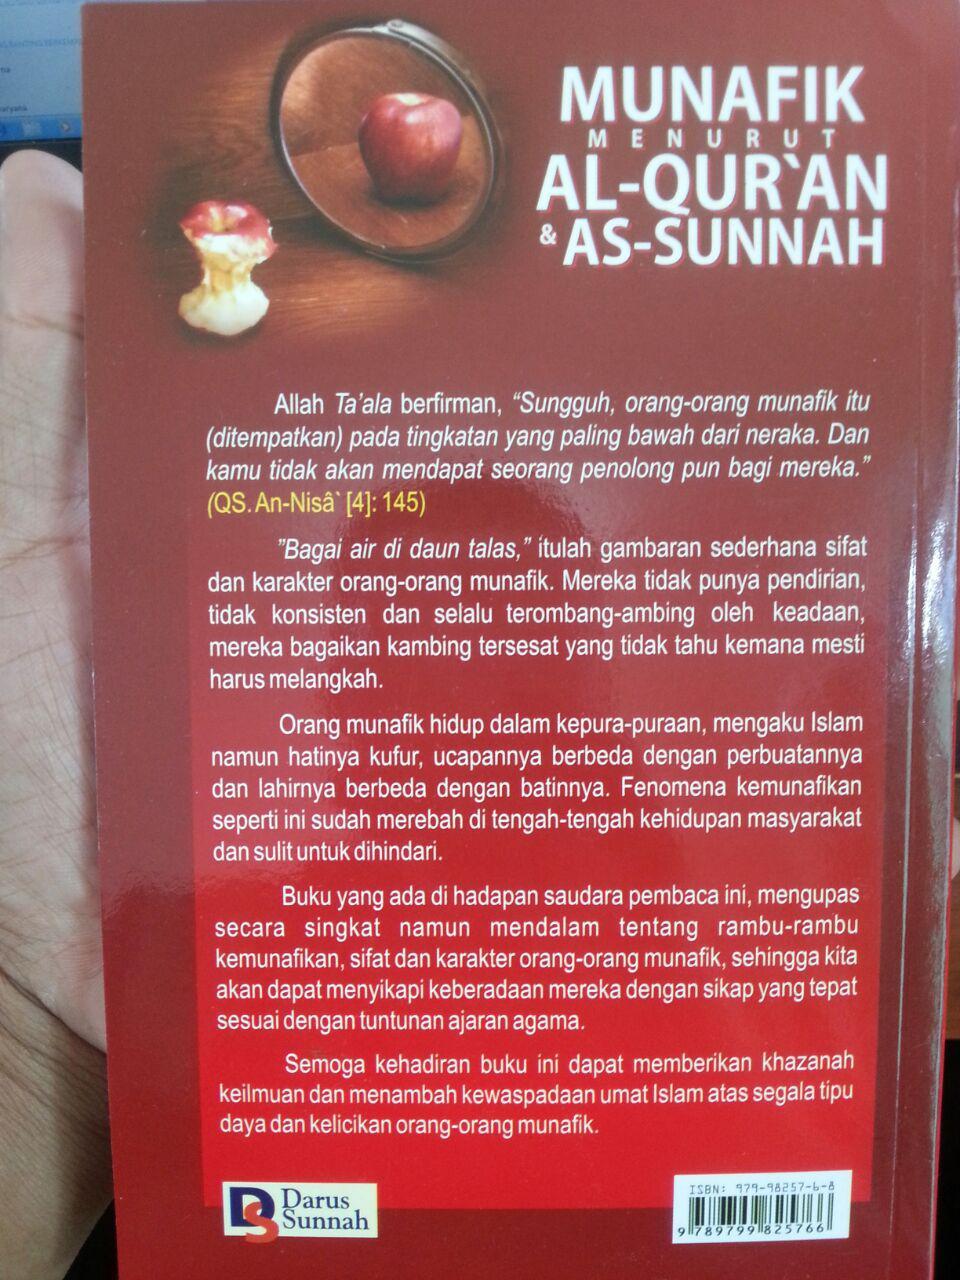 Buku Munafik Menurut Al-Quran dan As-Sunnah cover 2